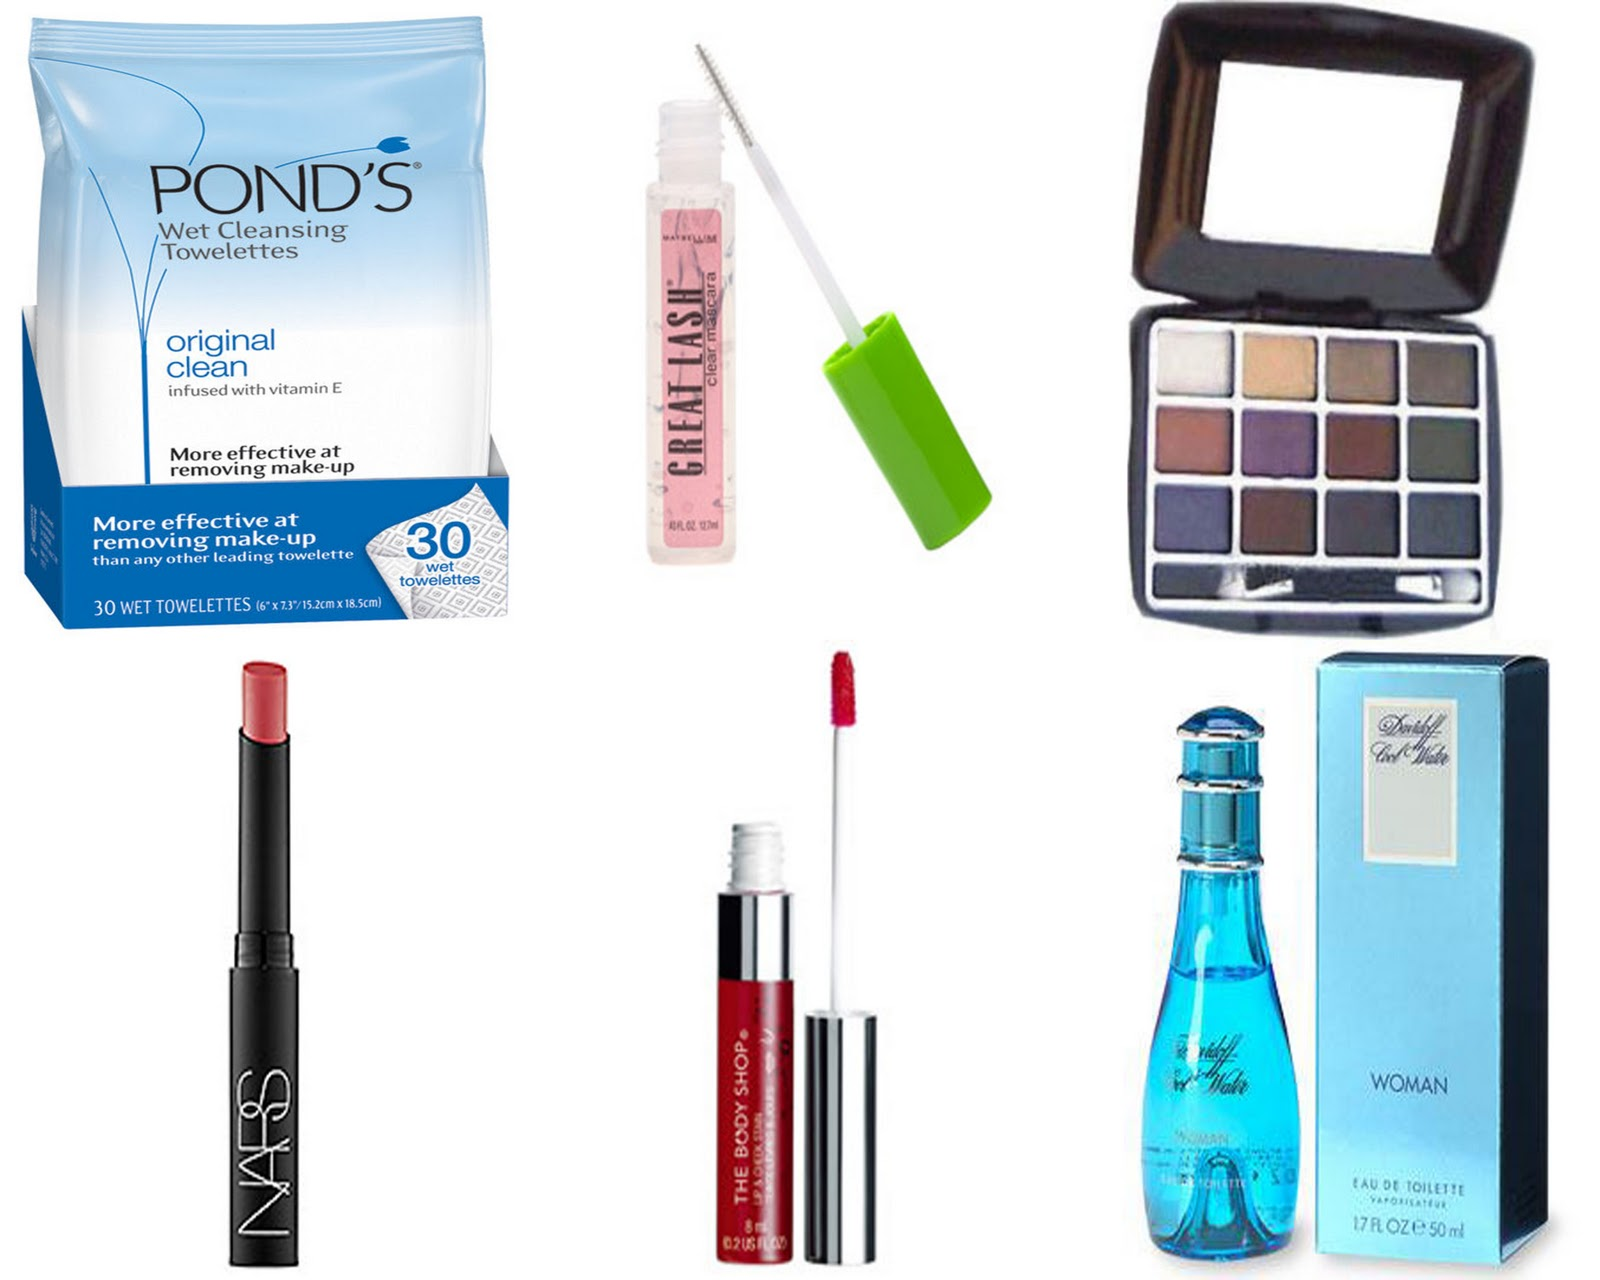 http://4.bp.blogspot.com/-MxTcJVSNHiE/TuRavNuWqbI/AAAAAAAAAio/S2KhiEszybc/s1600/products.jpg